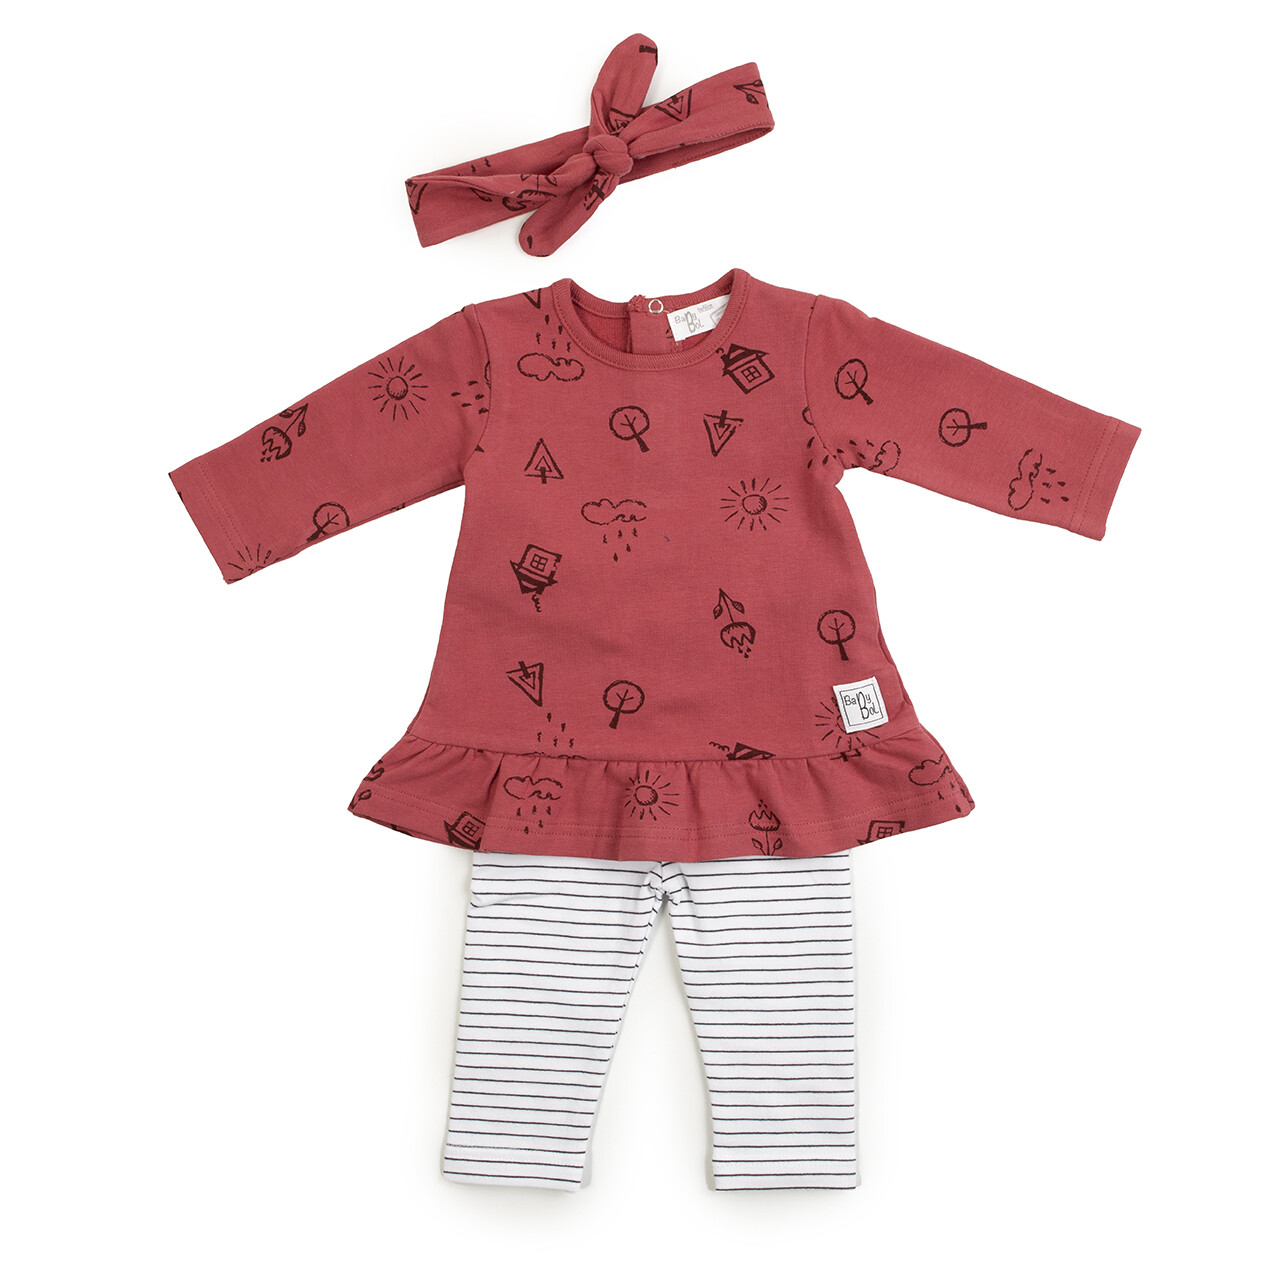 Babybol 3 piece Girls Suit with Hairband